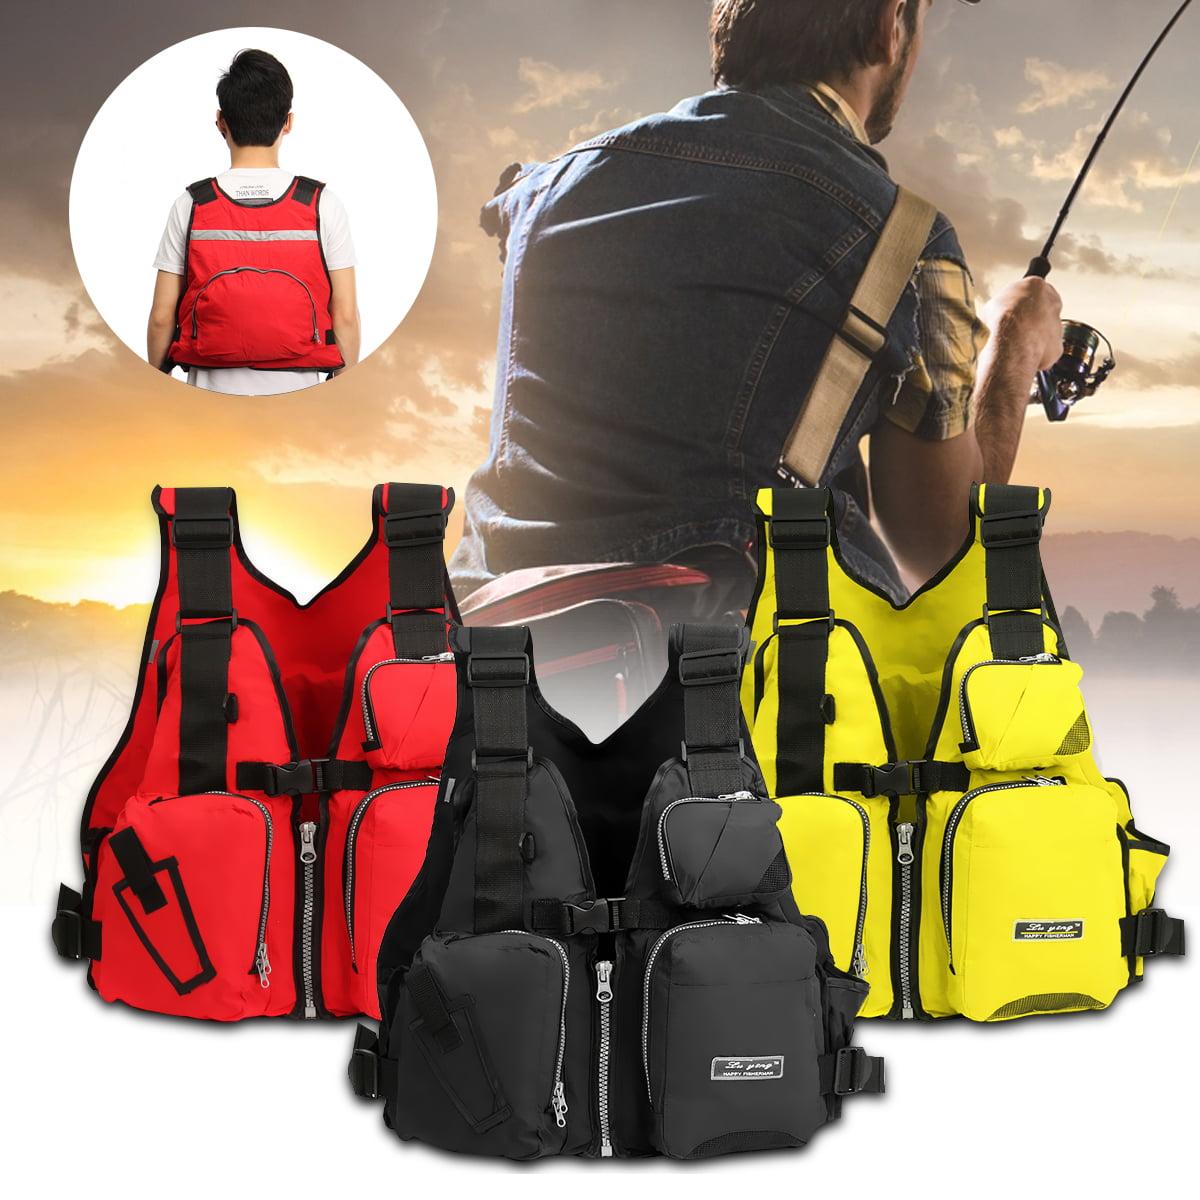 Professional Adjustable Adult Life Jacket Nylon EPE Swimming Boating Drifting Floating Vest with Multi-Pockets and Reflective Strip Fishing Life Vest